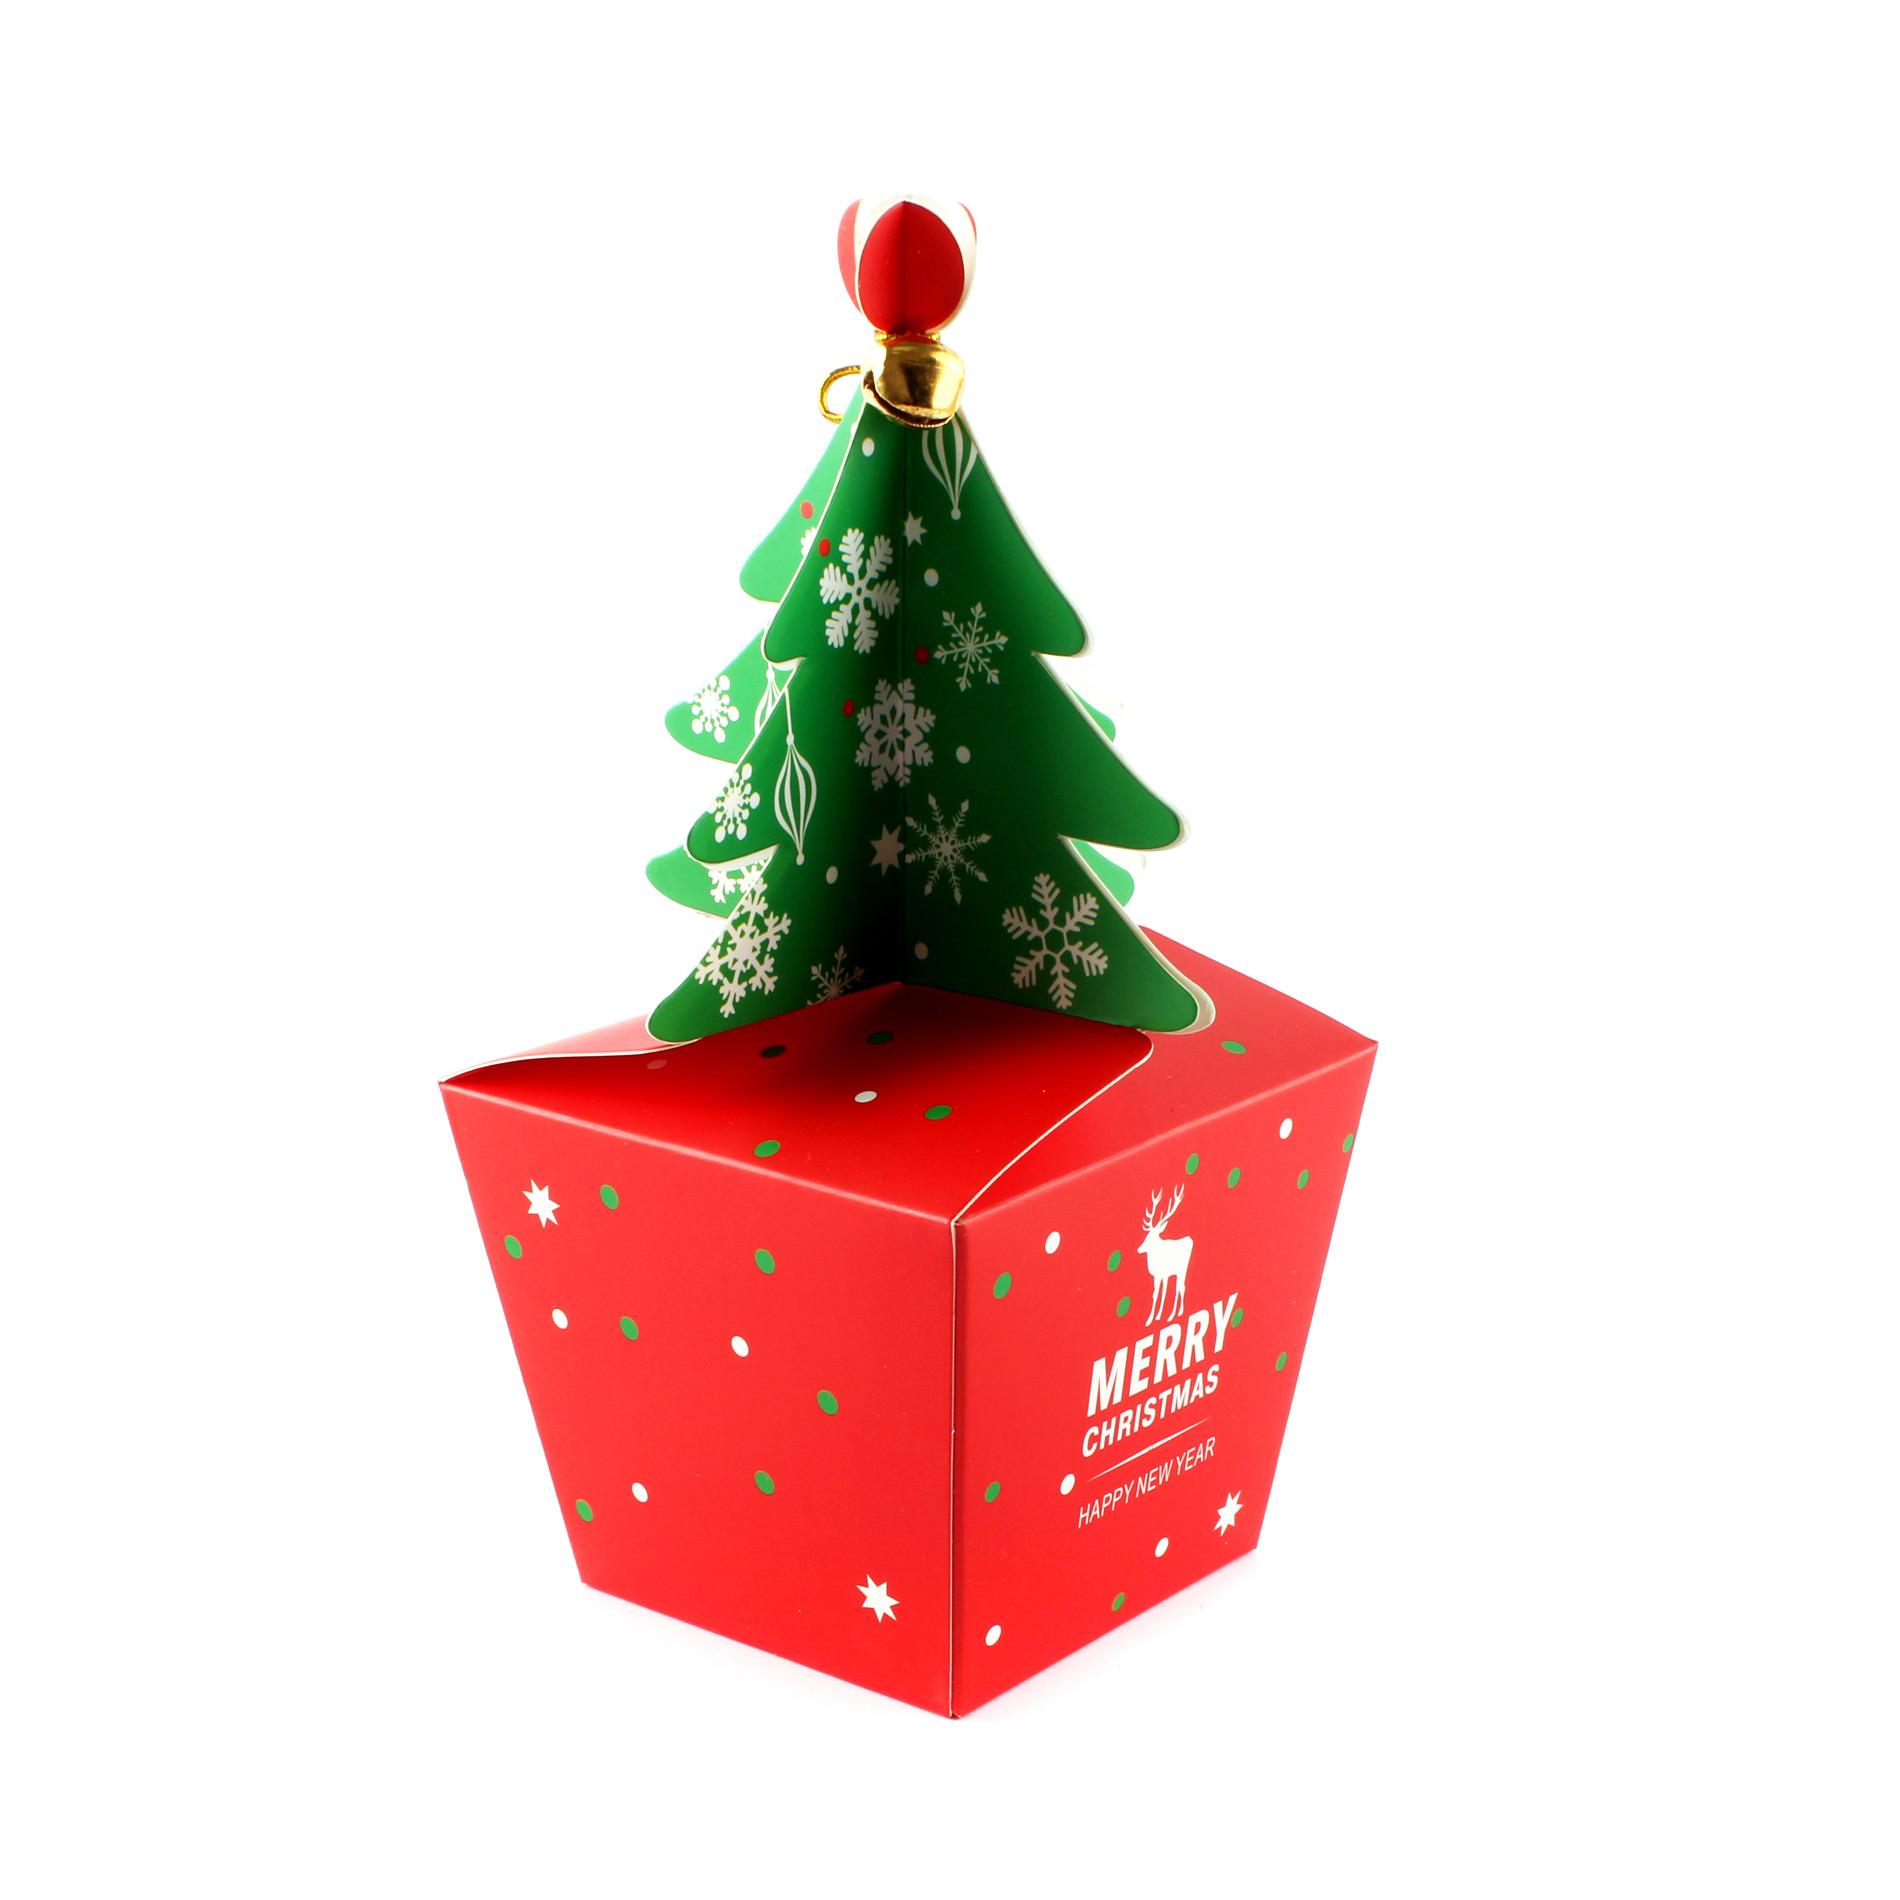 Christmas Candy Gift Boxes  5PCS Xmas Christmas Gift Boxes Christmas Eve Apple Box